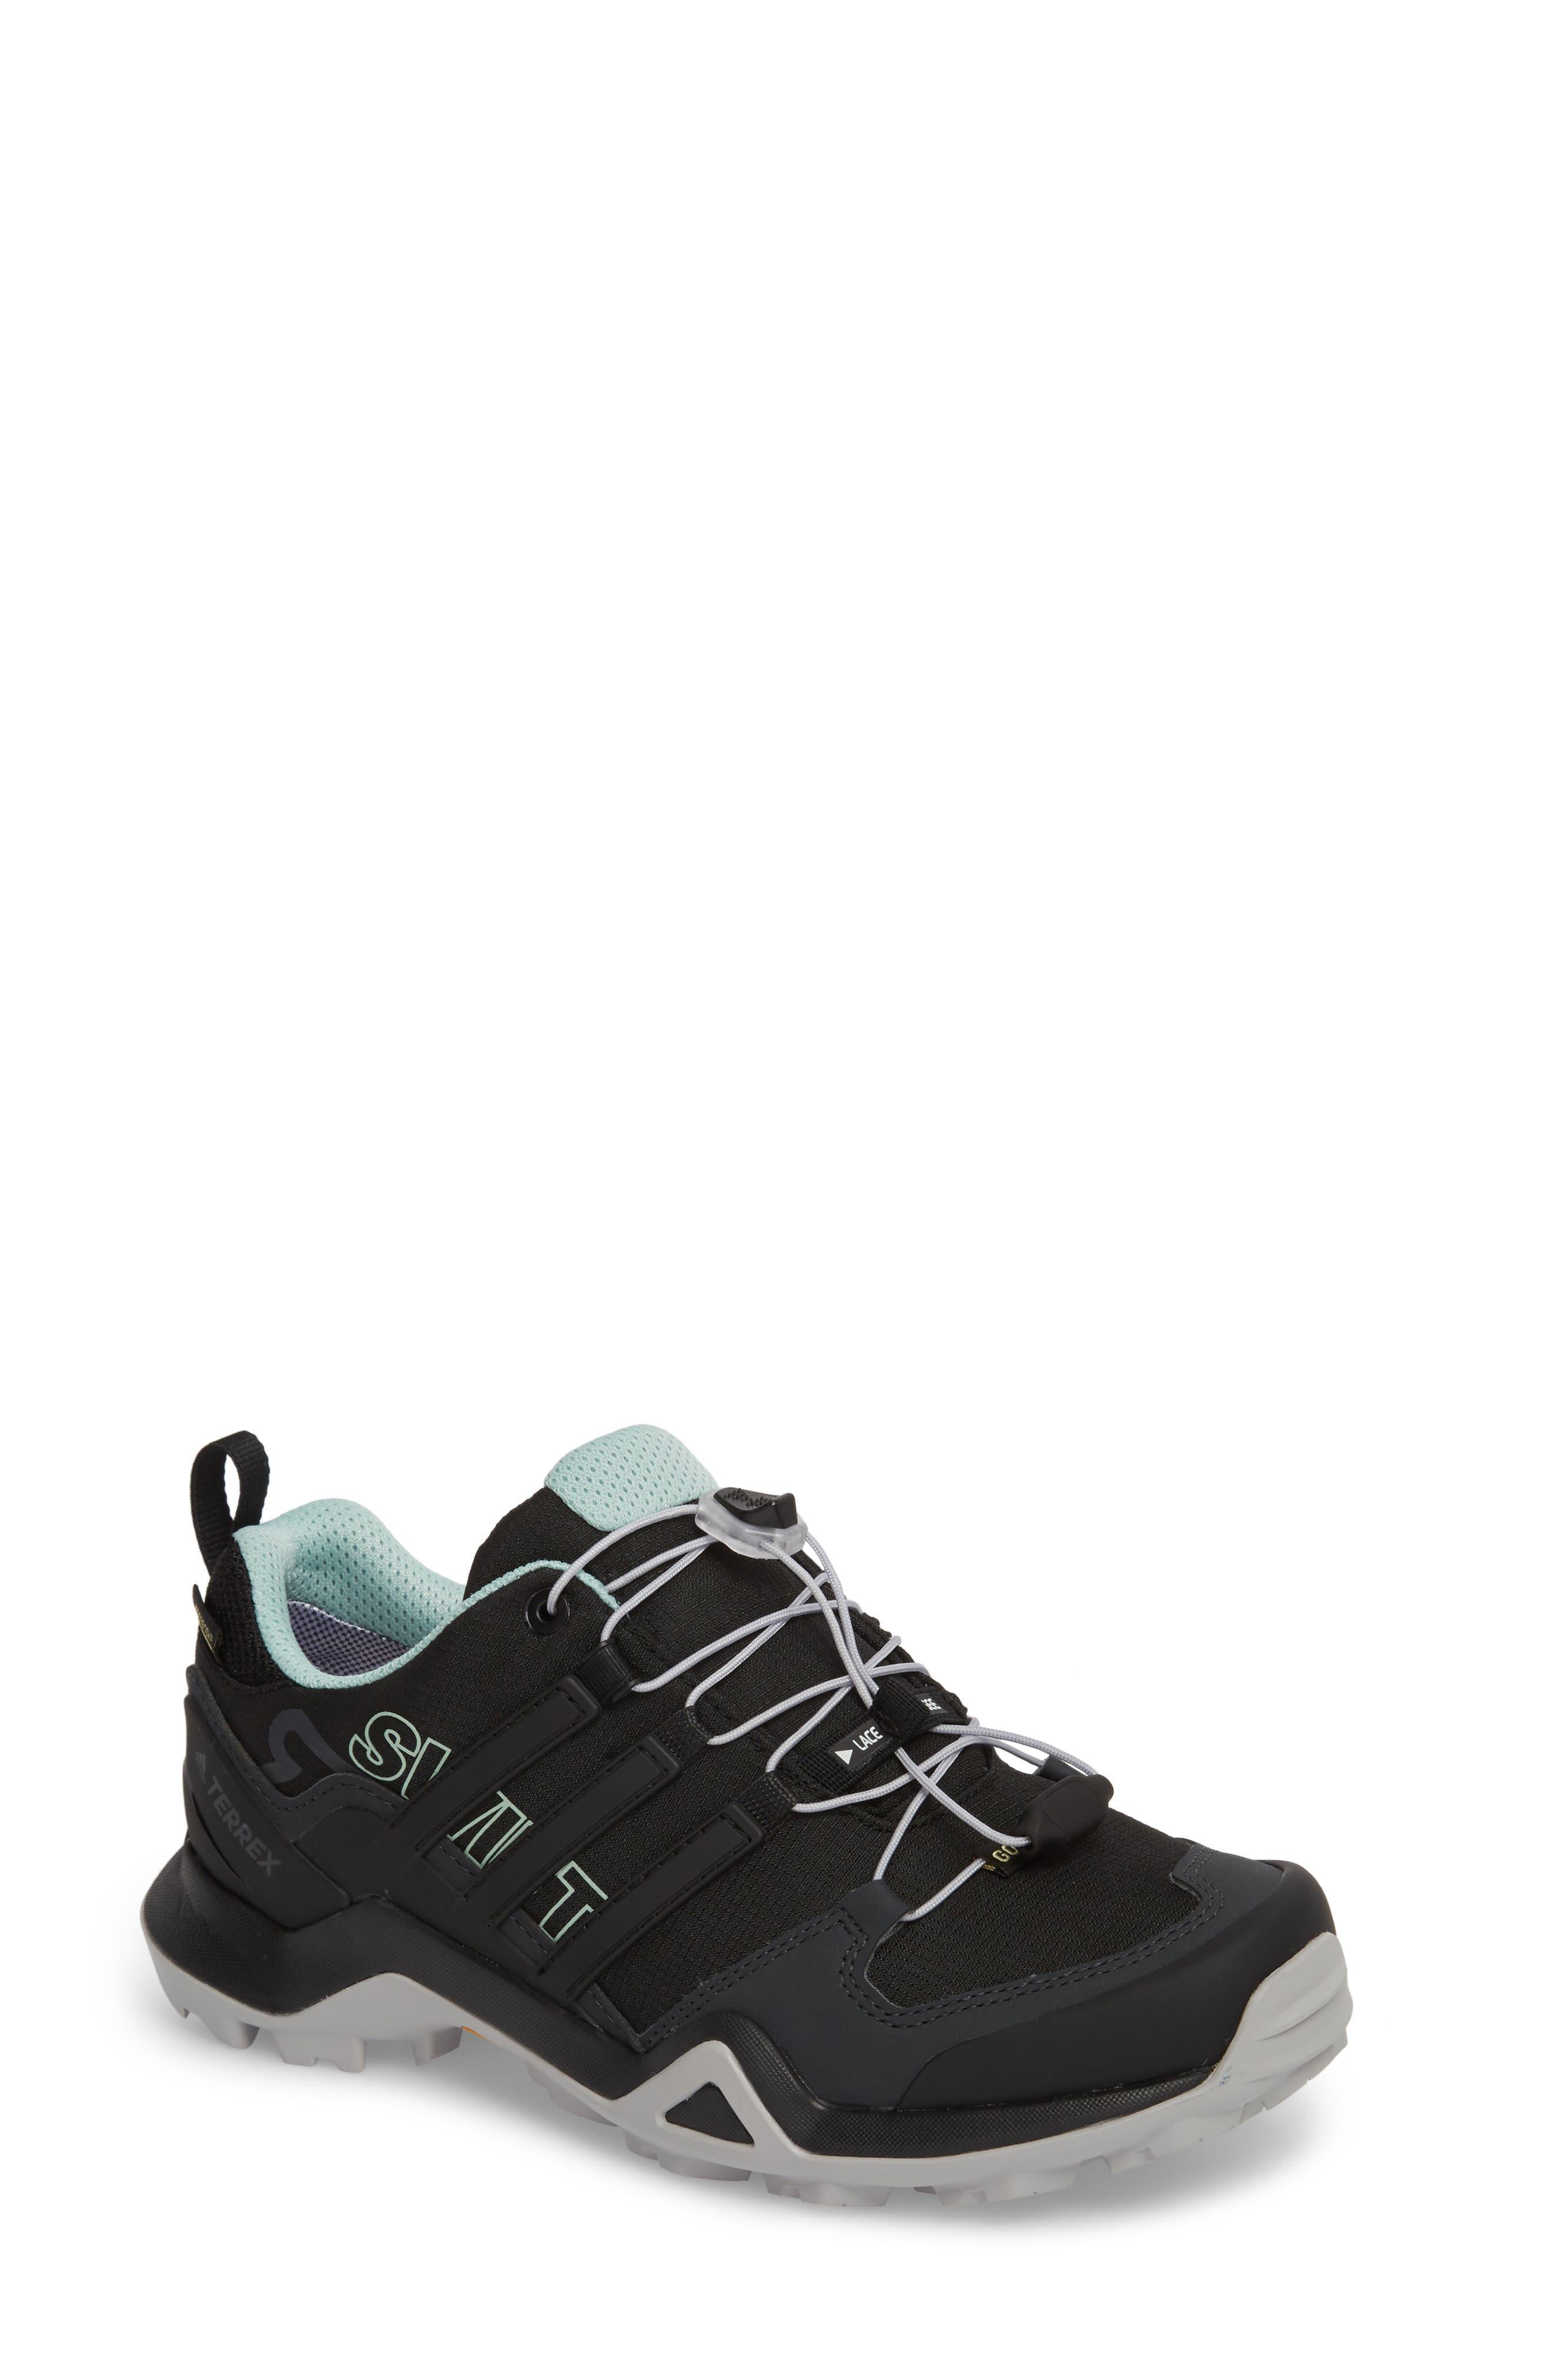 Terrex Swift R2 GTX Gore,Tex® Waterproof Hiking Shoe